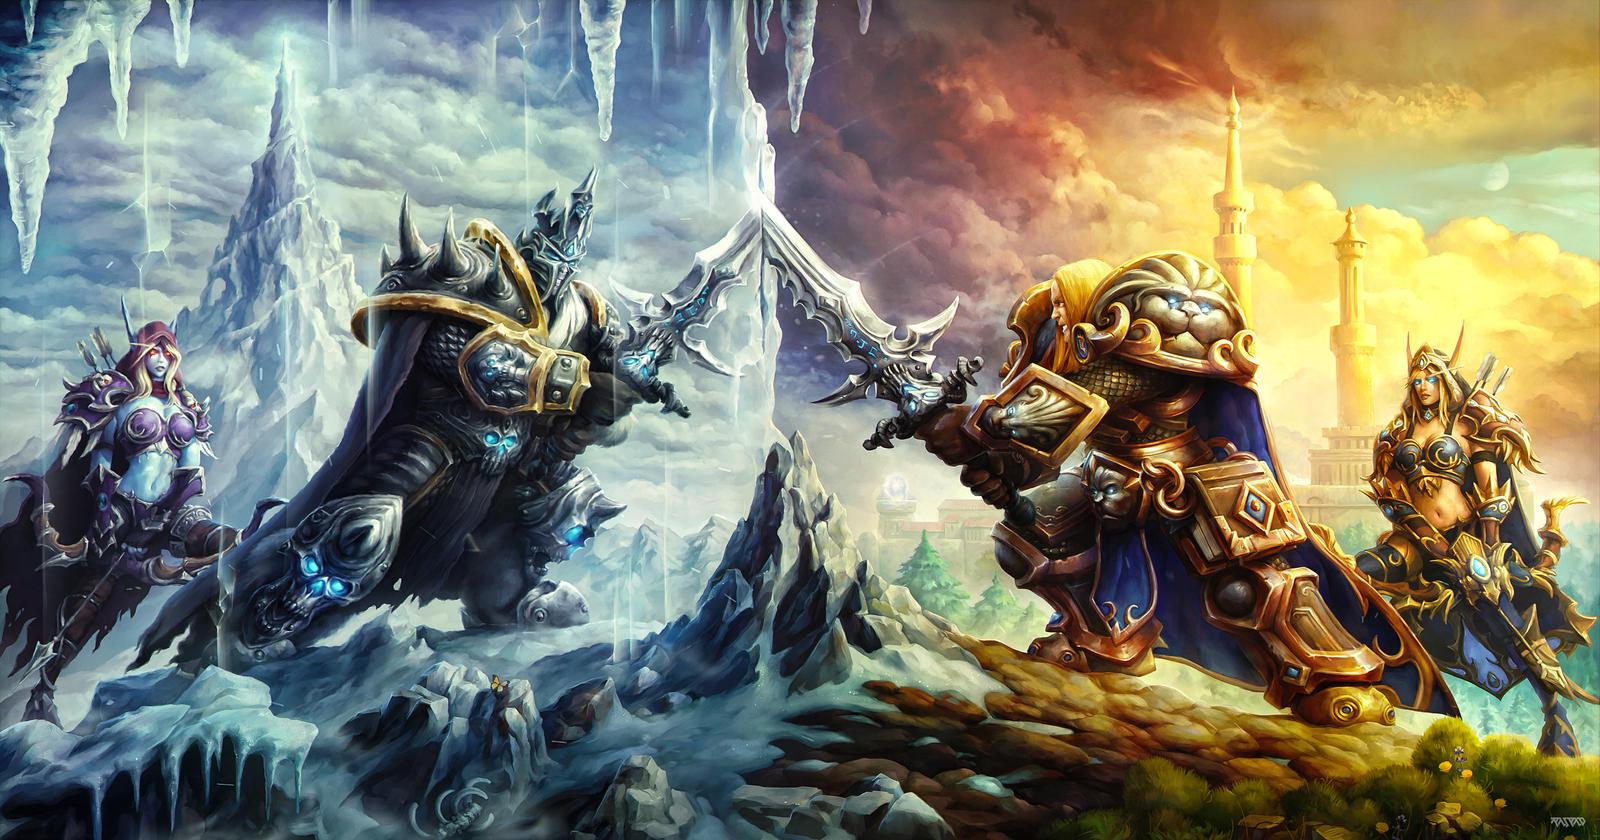 Battle of Prince Arthas by AlexRaspad on DeviantArt